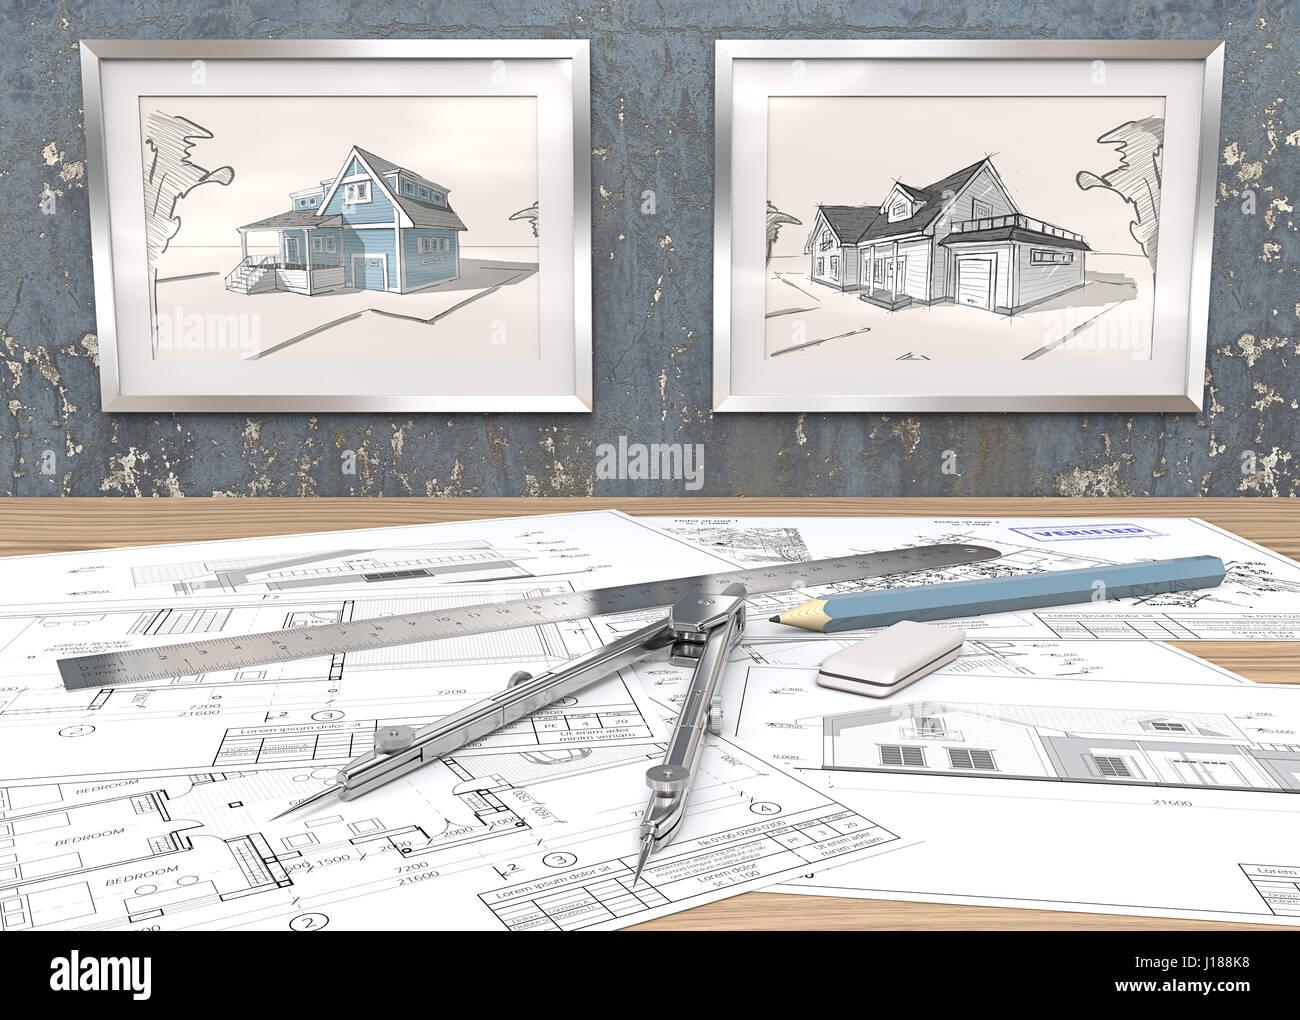 Großartig Bilderrahmenplan Galerie - Rahmen Ideen - markjohnsonshow.info